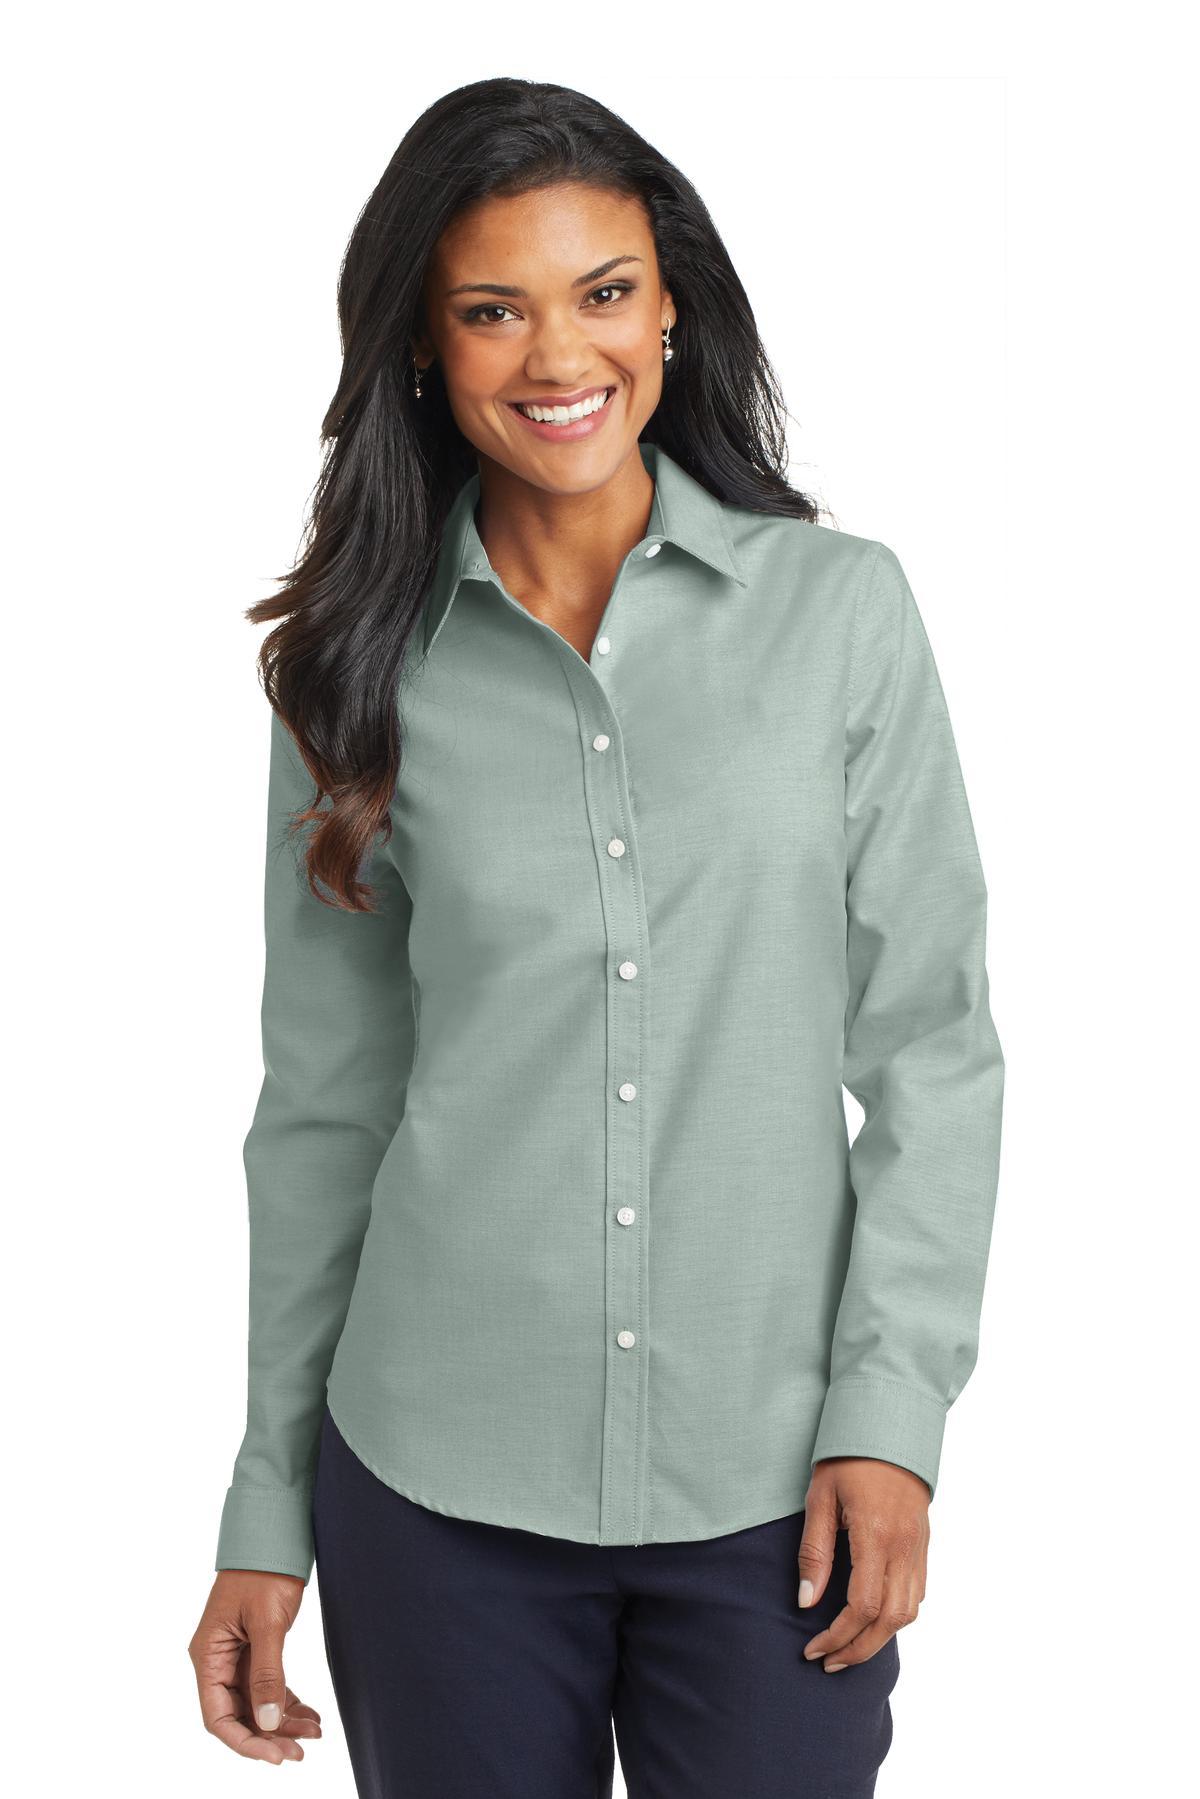 Port Authority® L658 - Ladies SuperPro Oxford Shirt